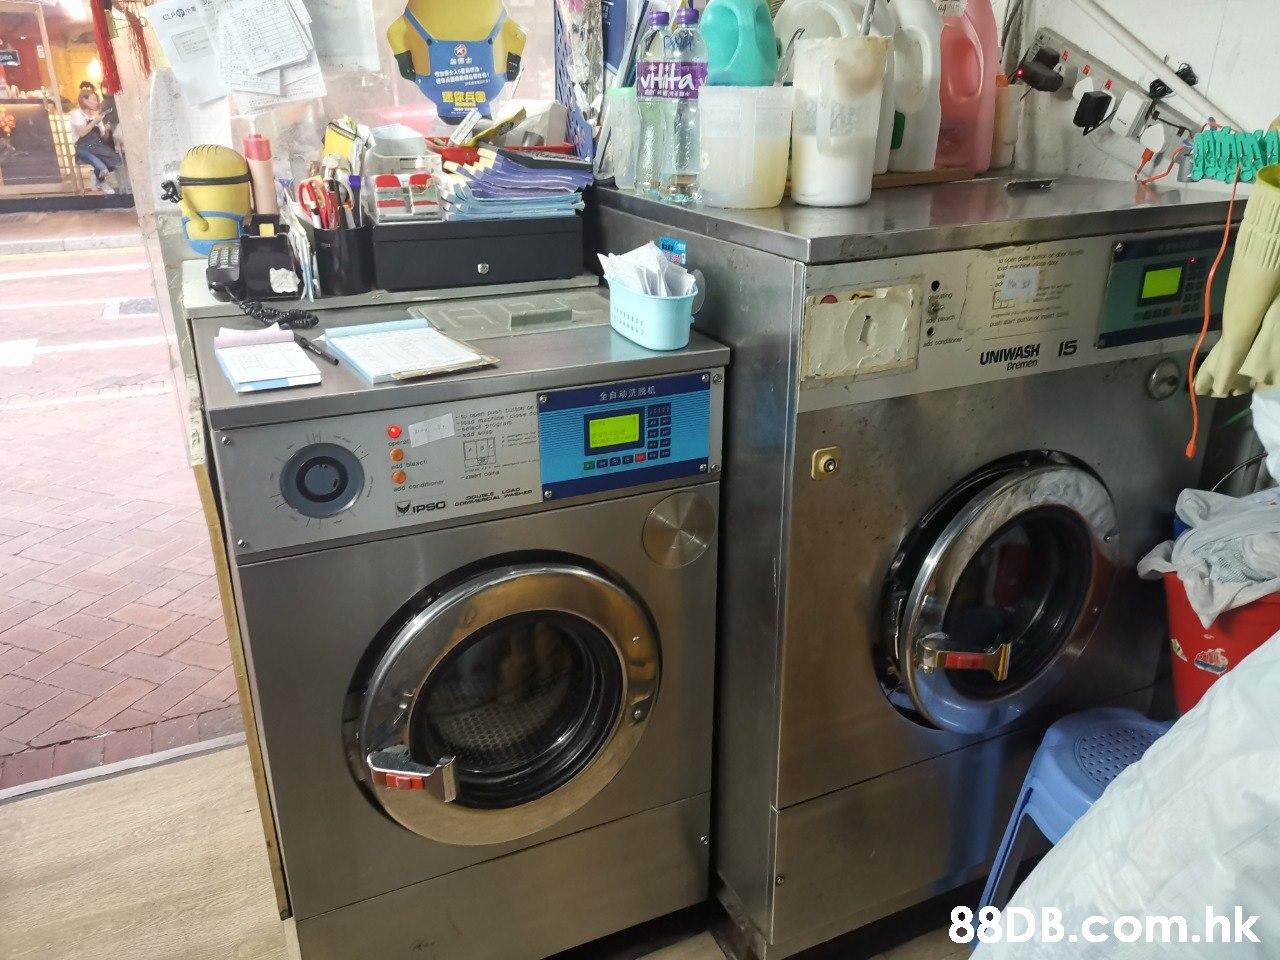 UNIWASH15 全自动洗脱机 B.com.hk  Washing machine,Laundry,Major appliance,Clothes dryer,Laundry room